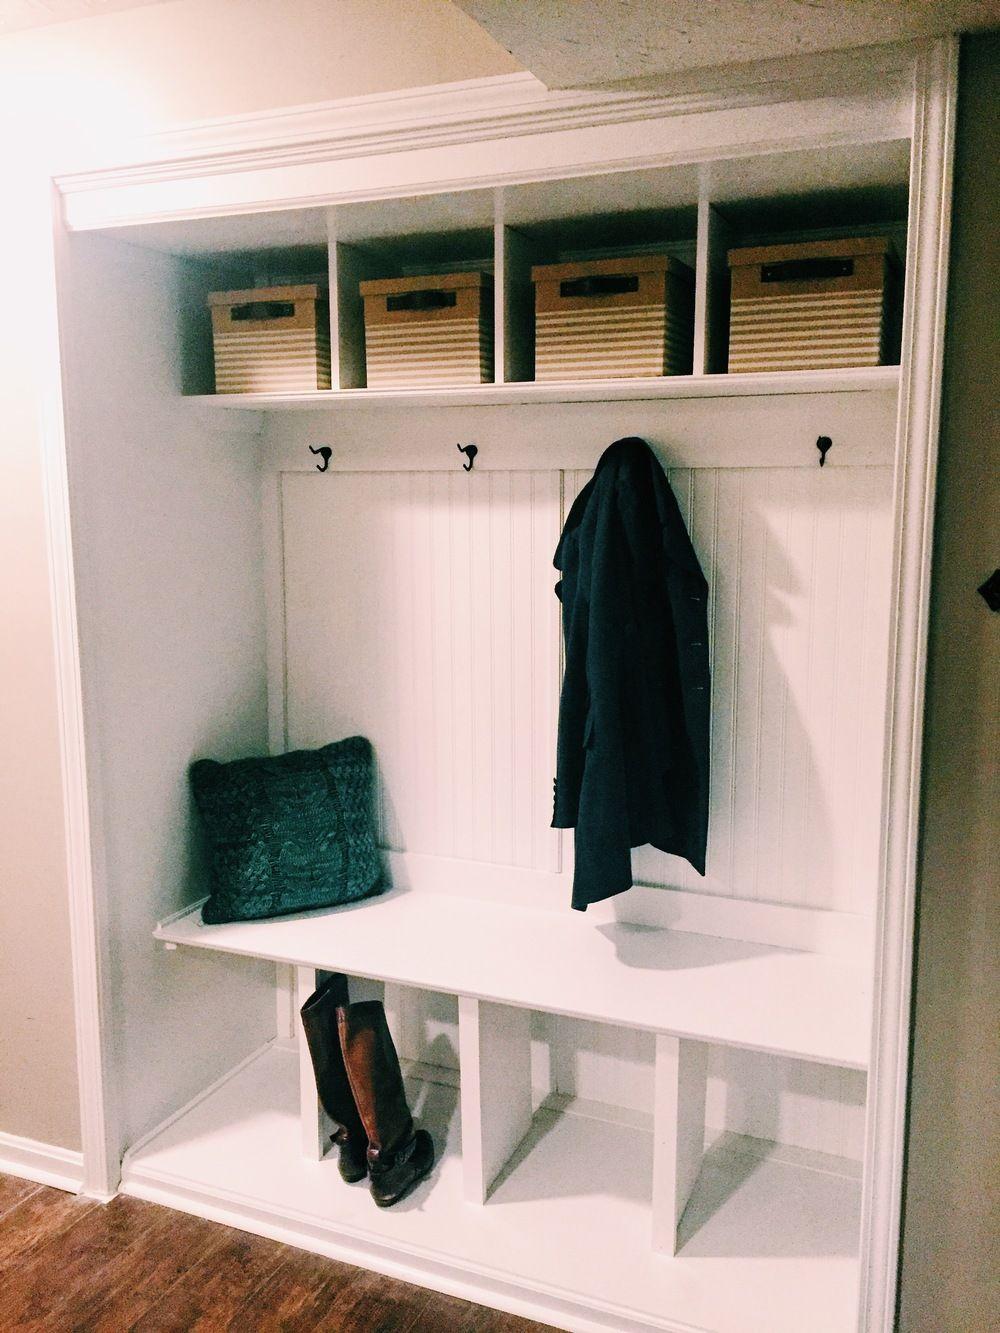 How to Turn a Closet Into a Mudroom Converted closet